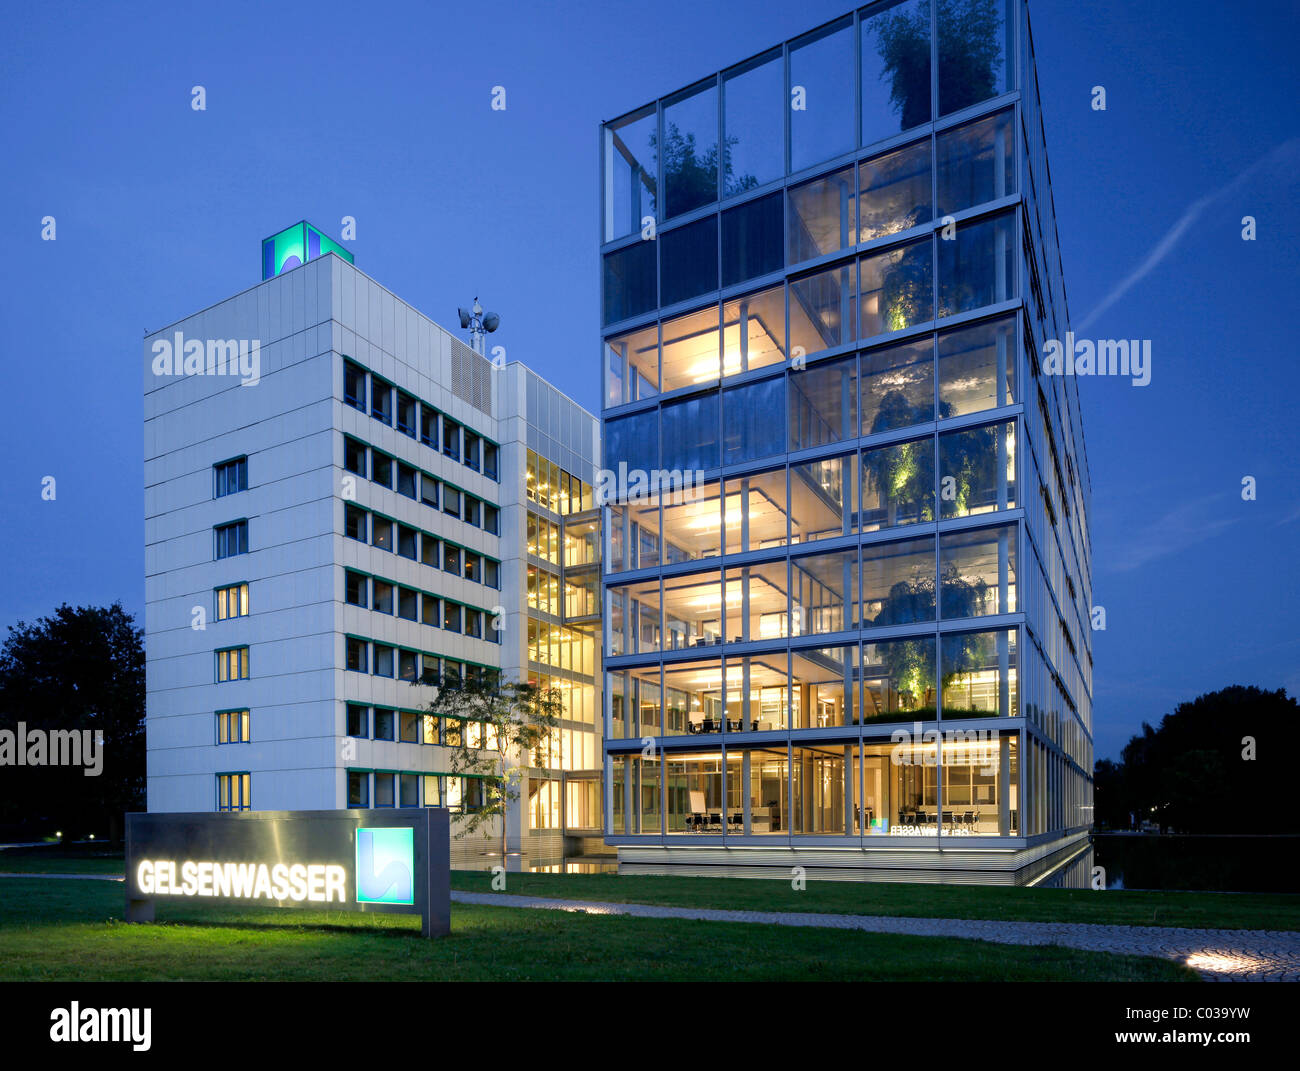 Headquarters of Gelsenwasser utilities company, Gelsenkirchen, Ruhr Area, North Rhine-Westphalia, Germany, Europe - Stock Image